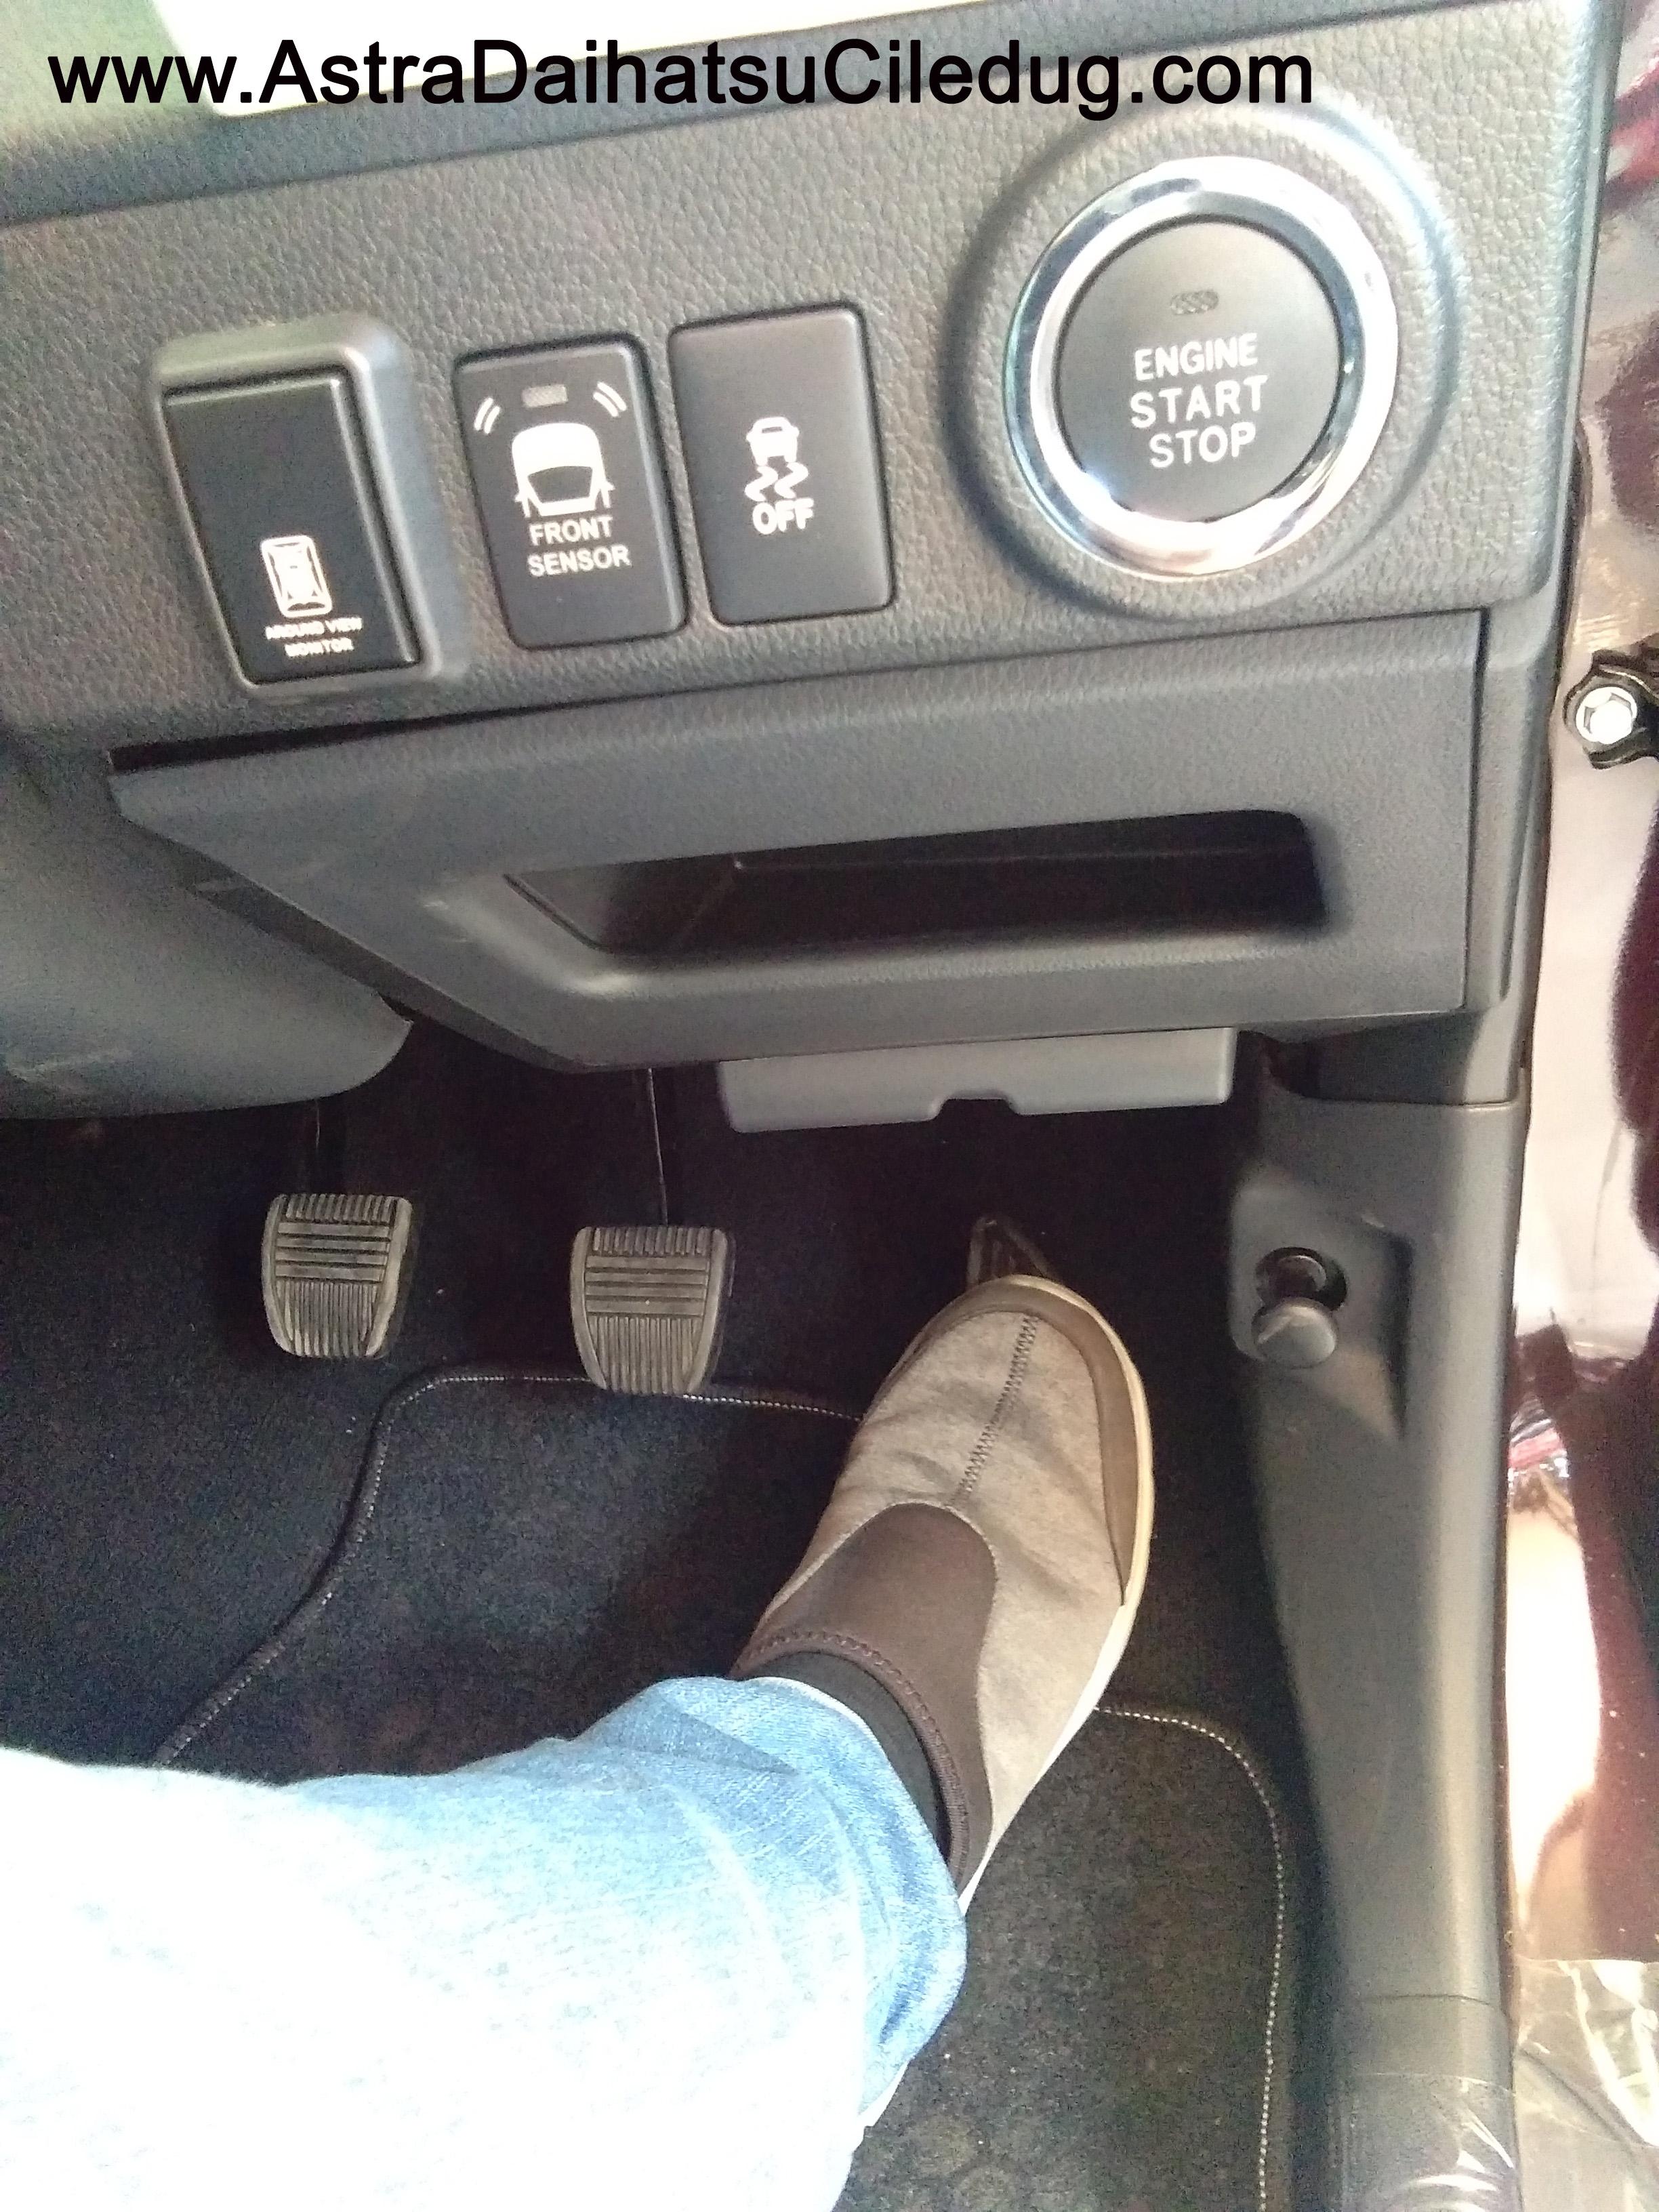 Daihatsu Ciledug 5 TIPS SAFETY DRIVING